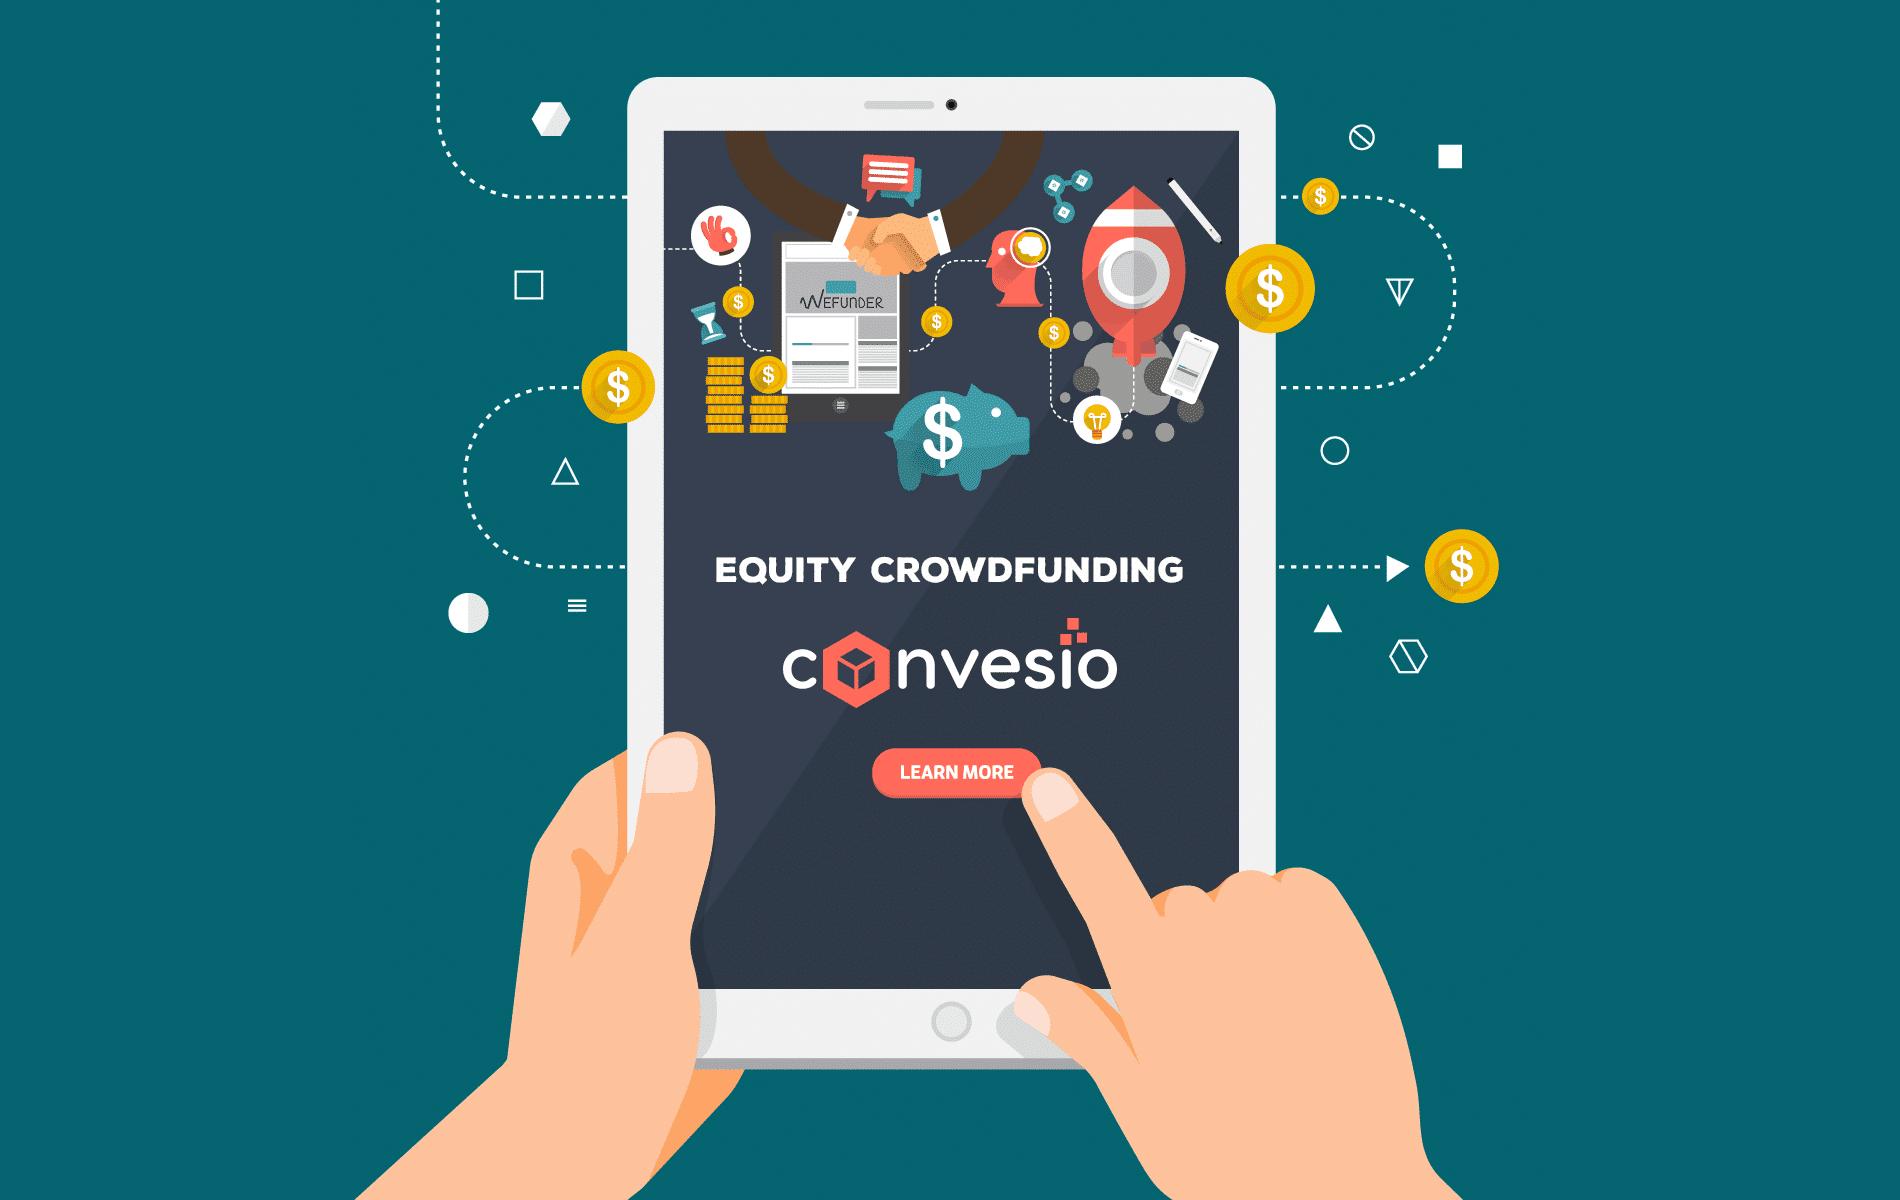 Convesio Crowdfunding